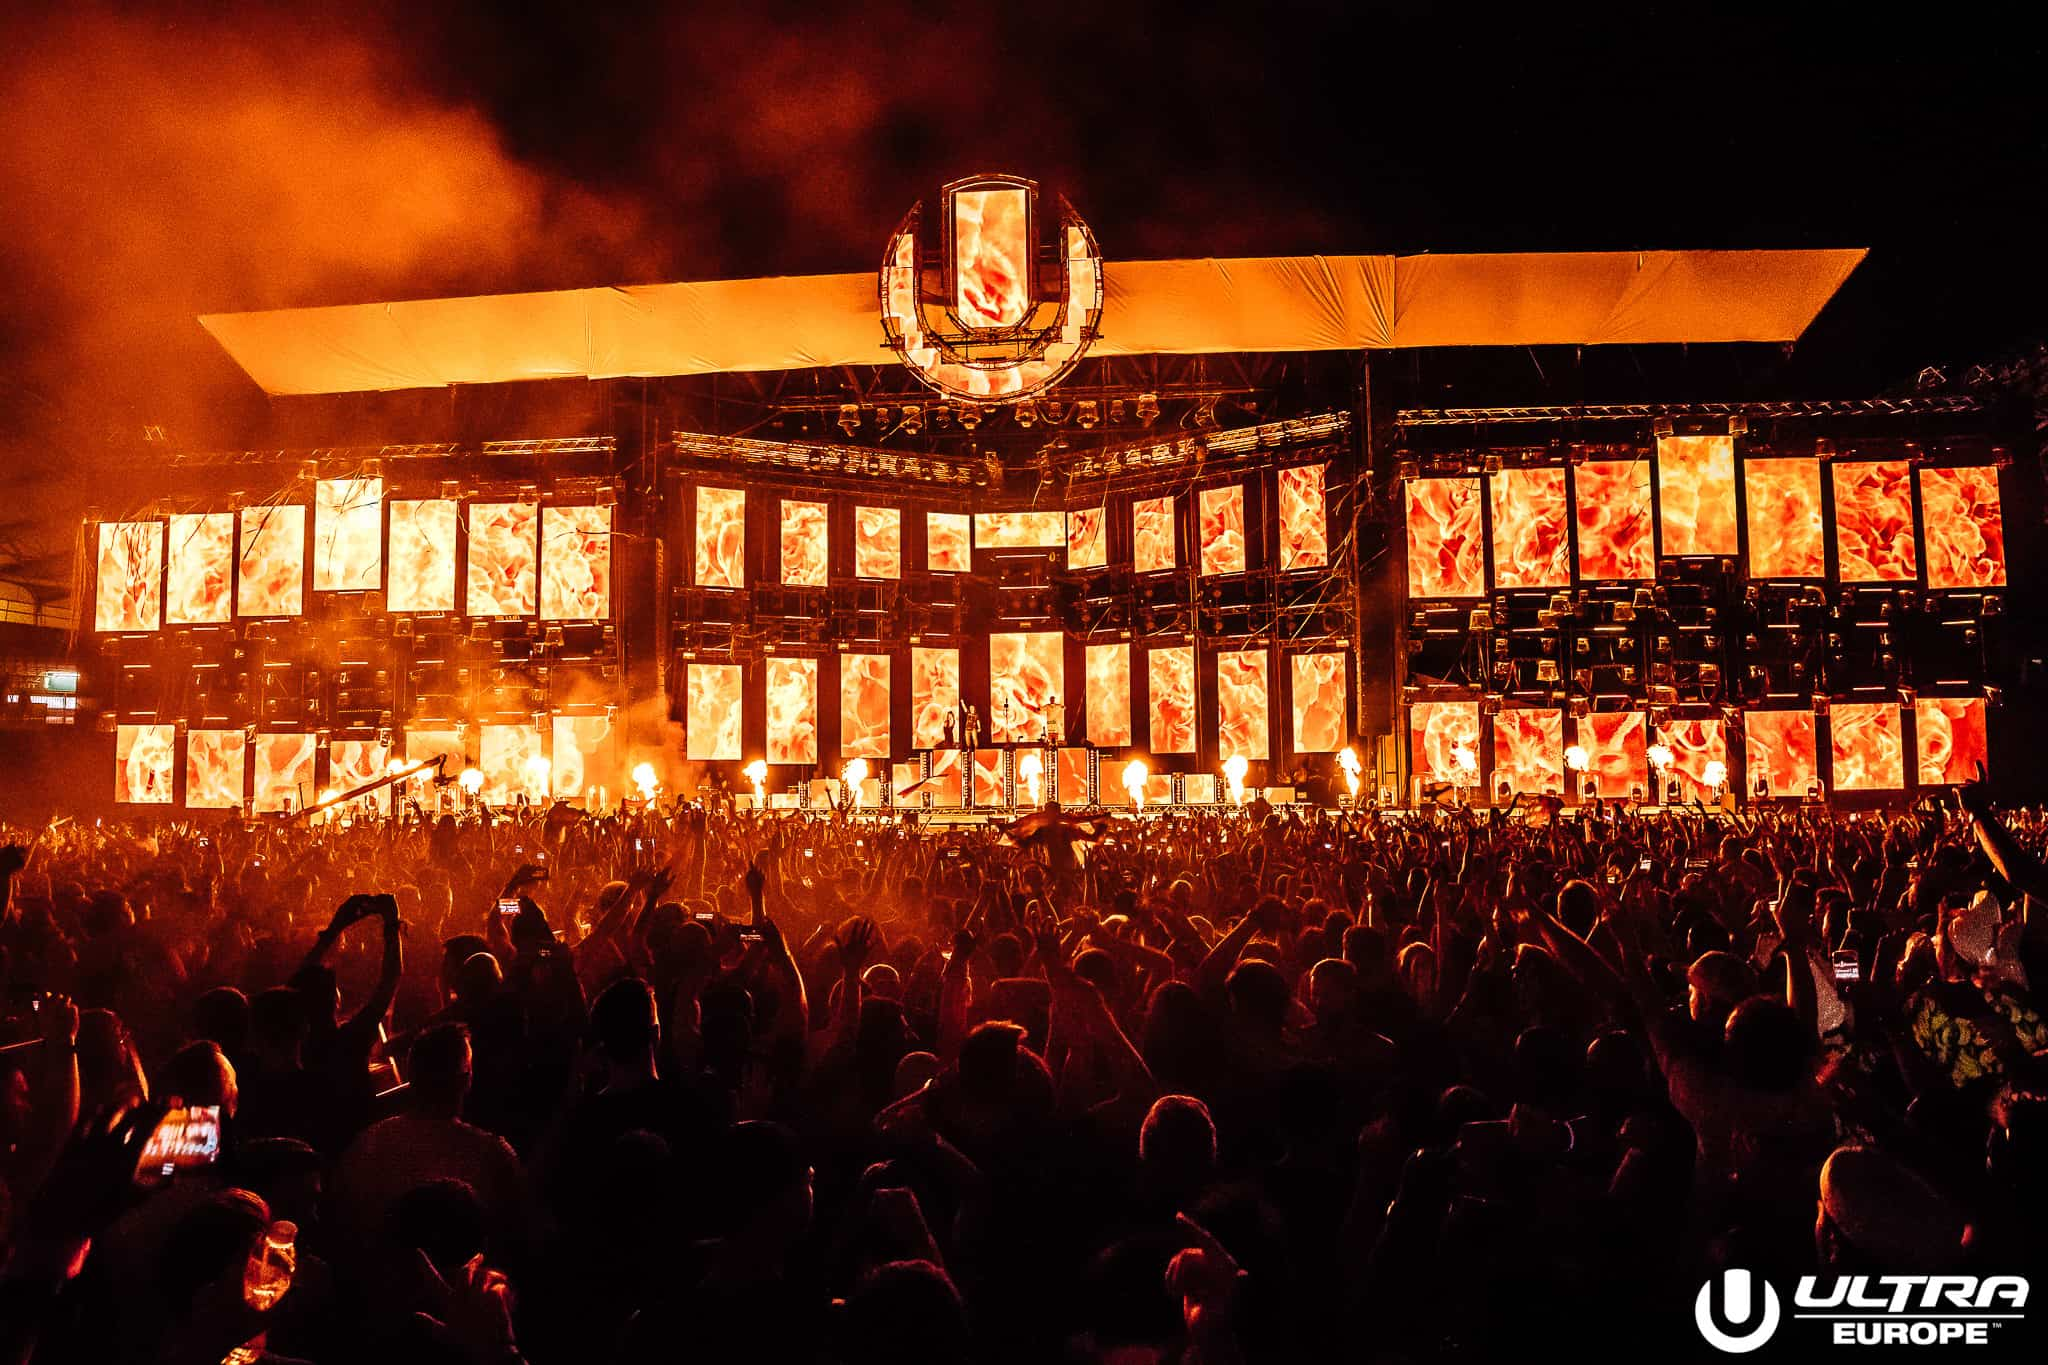 Ultra Europe Celebrates 5th Anniversary